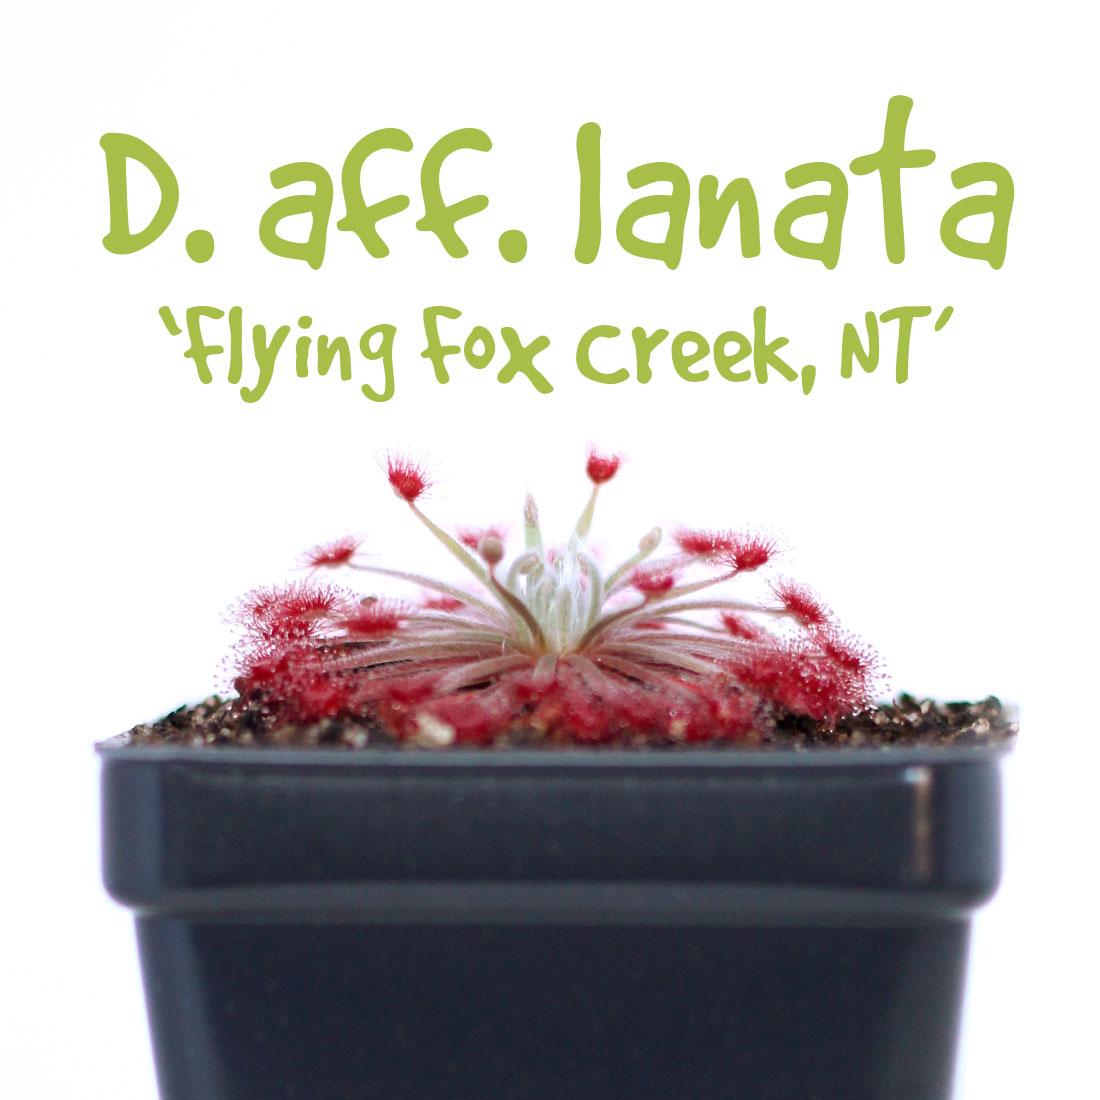 Drosera aff. lanata 'Flying Fox Creek, NT'